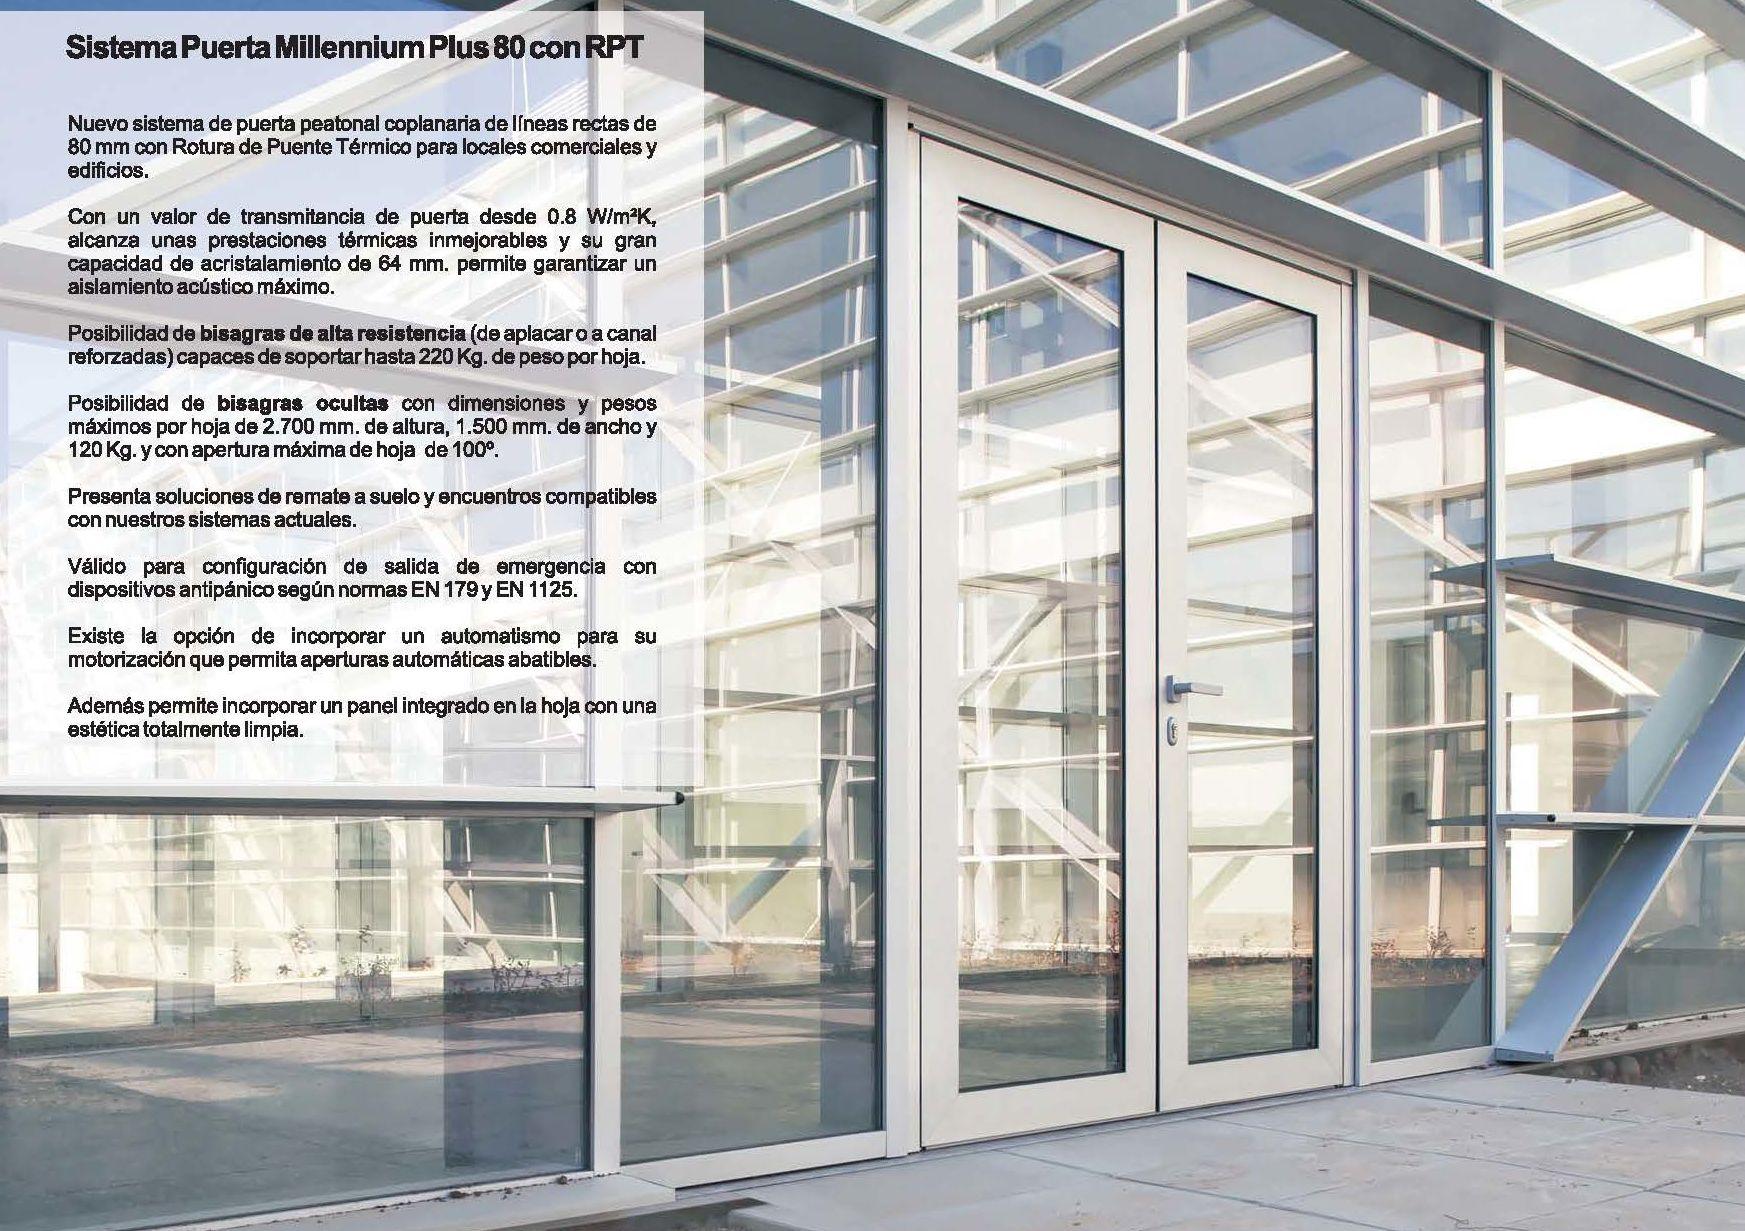 Puerta Millennium Plus 80 RPT: Catálogo de Jgmaluminio